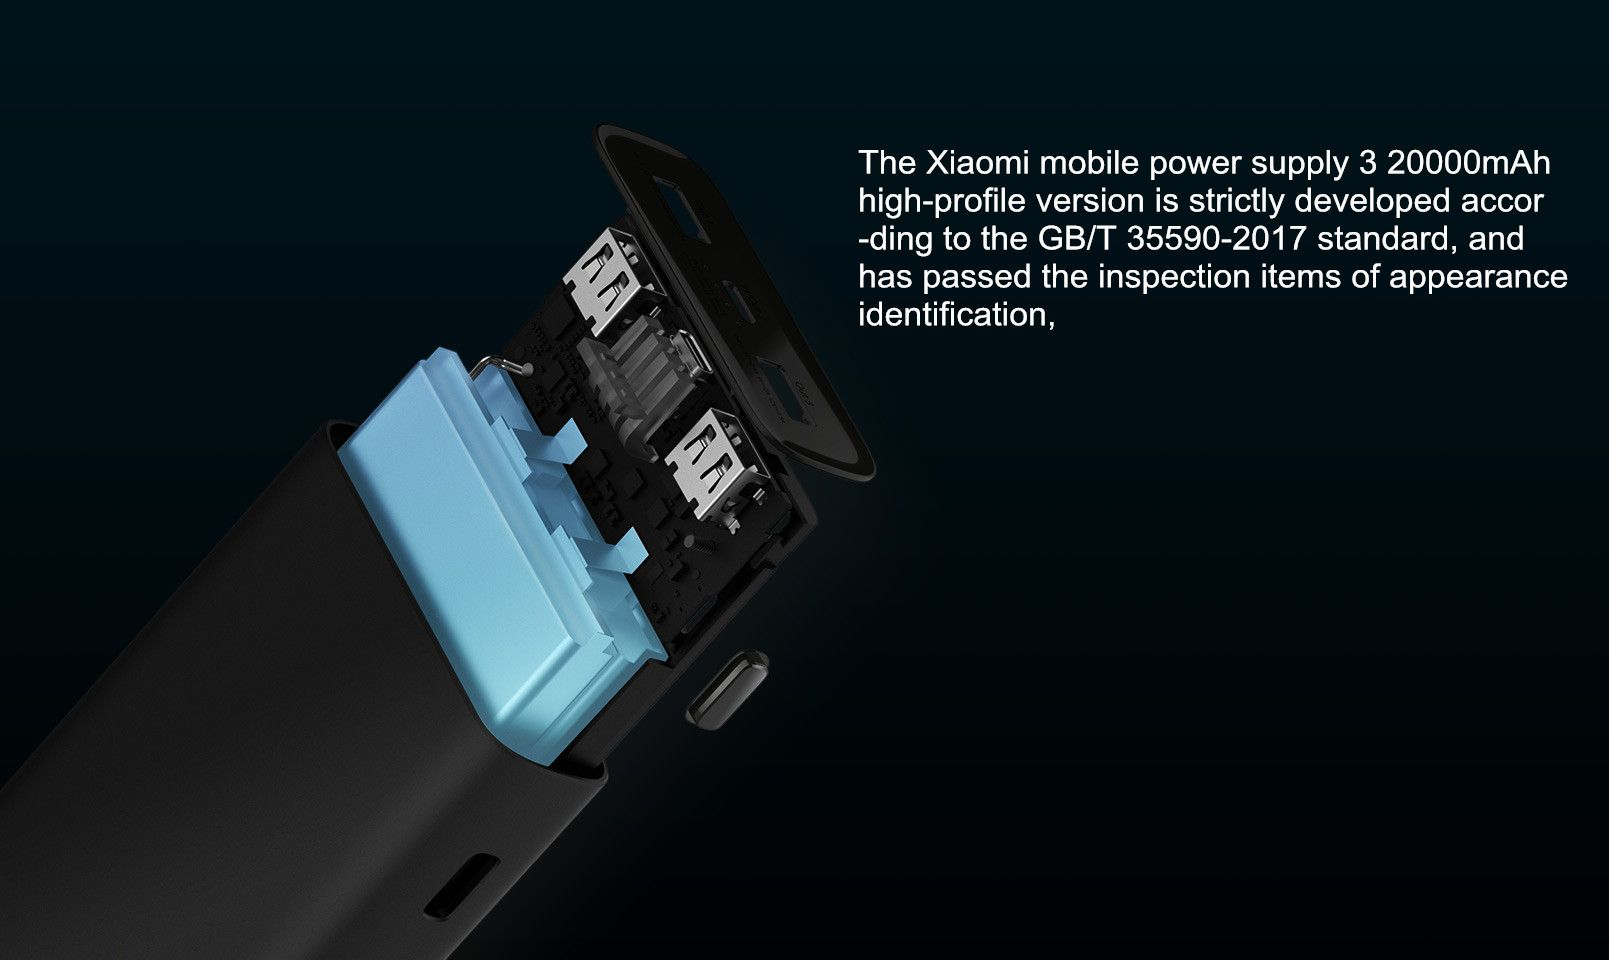 Xiaomi Power Bank 3 Pro 20000mah Usb C Qc 3 0 Fast Charge Power Bank (3)